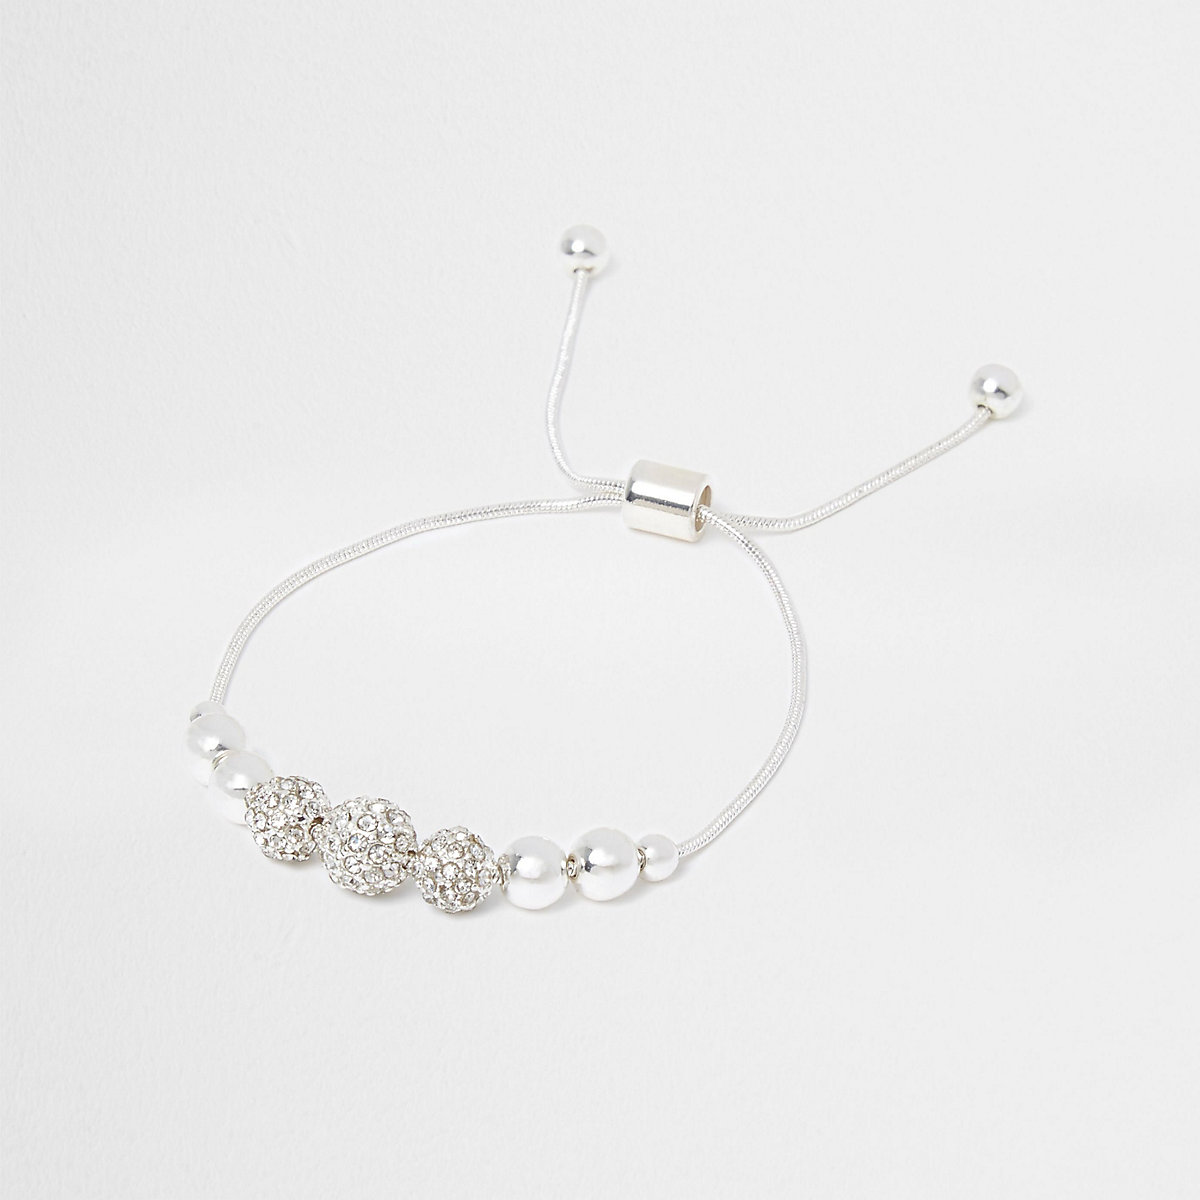 Silver tone rhinestone bead lariat bracelet